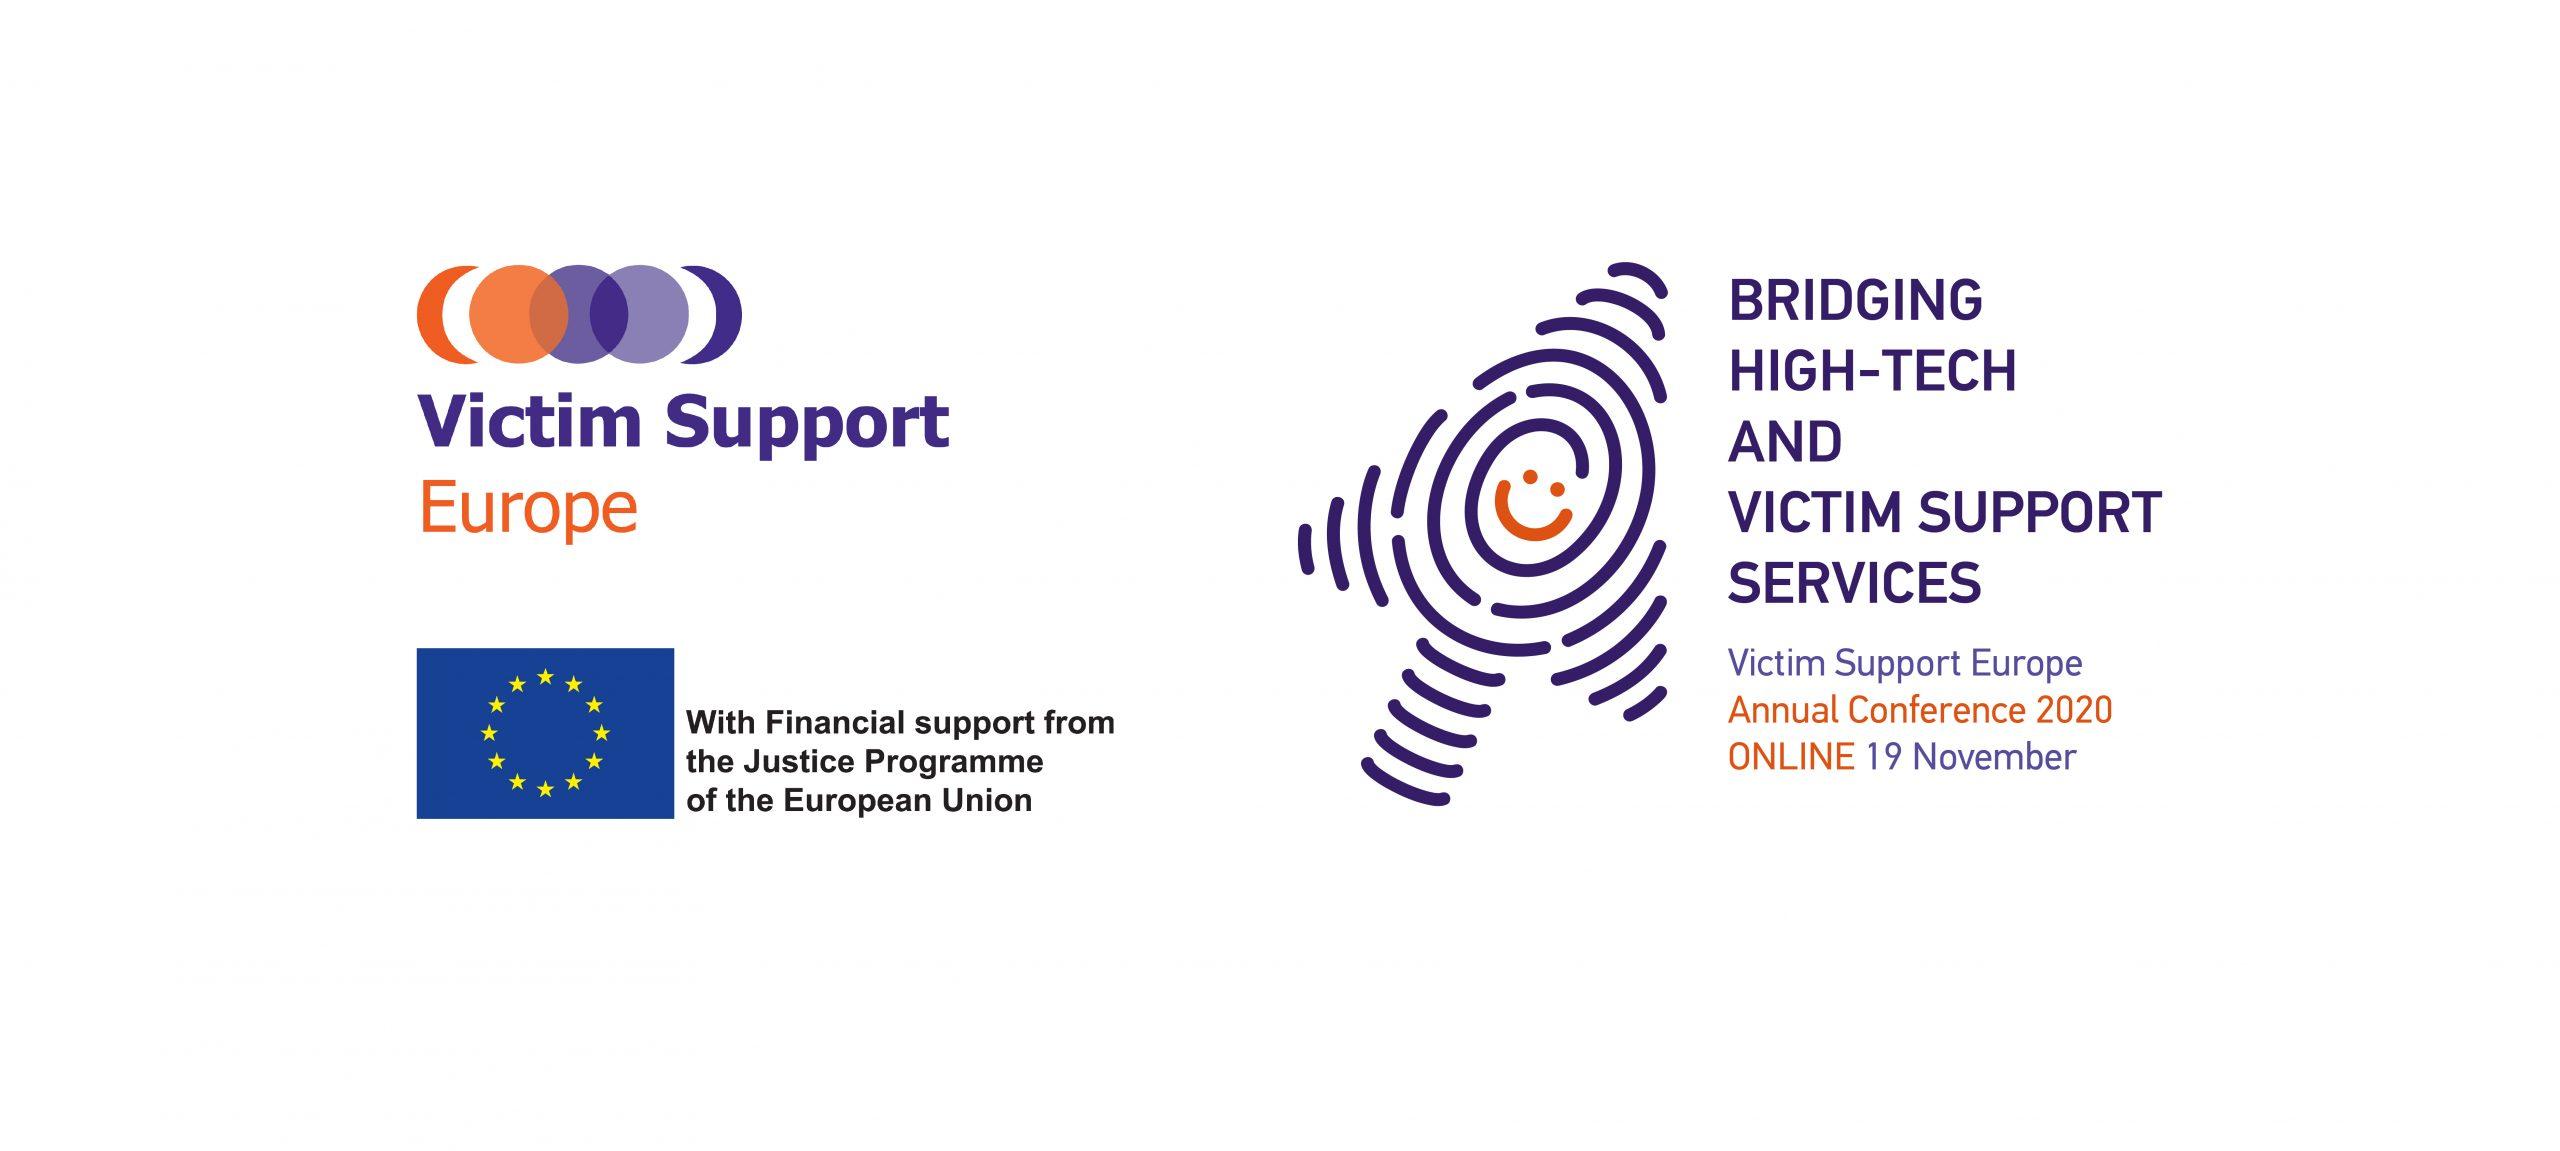 https://2020.vse-conference.eu/wp-content/uploads/2020/09/Train-logo-1-scaled.jpg